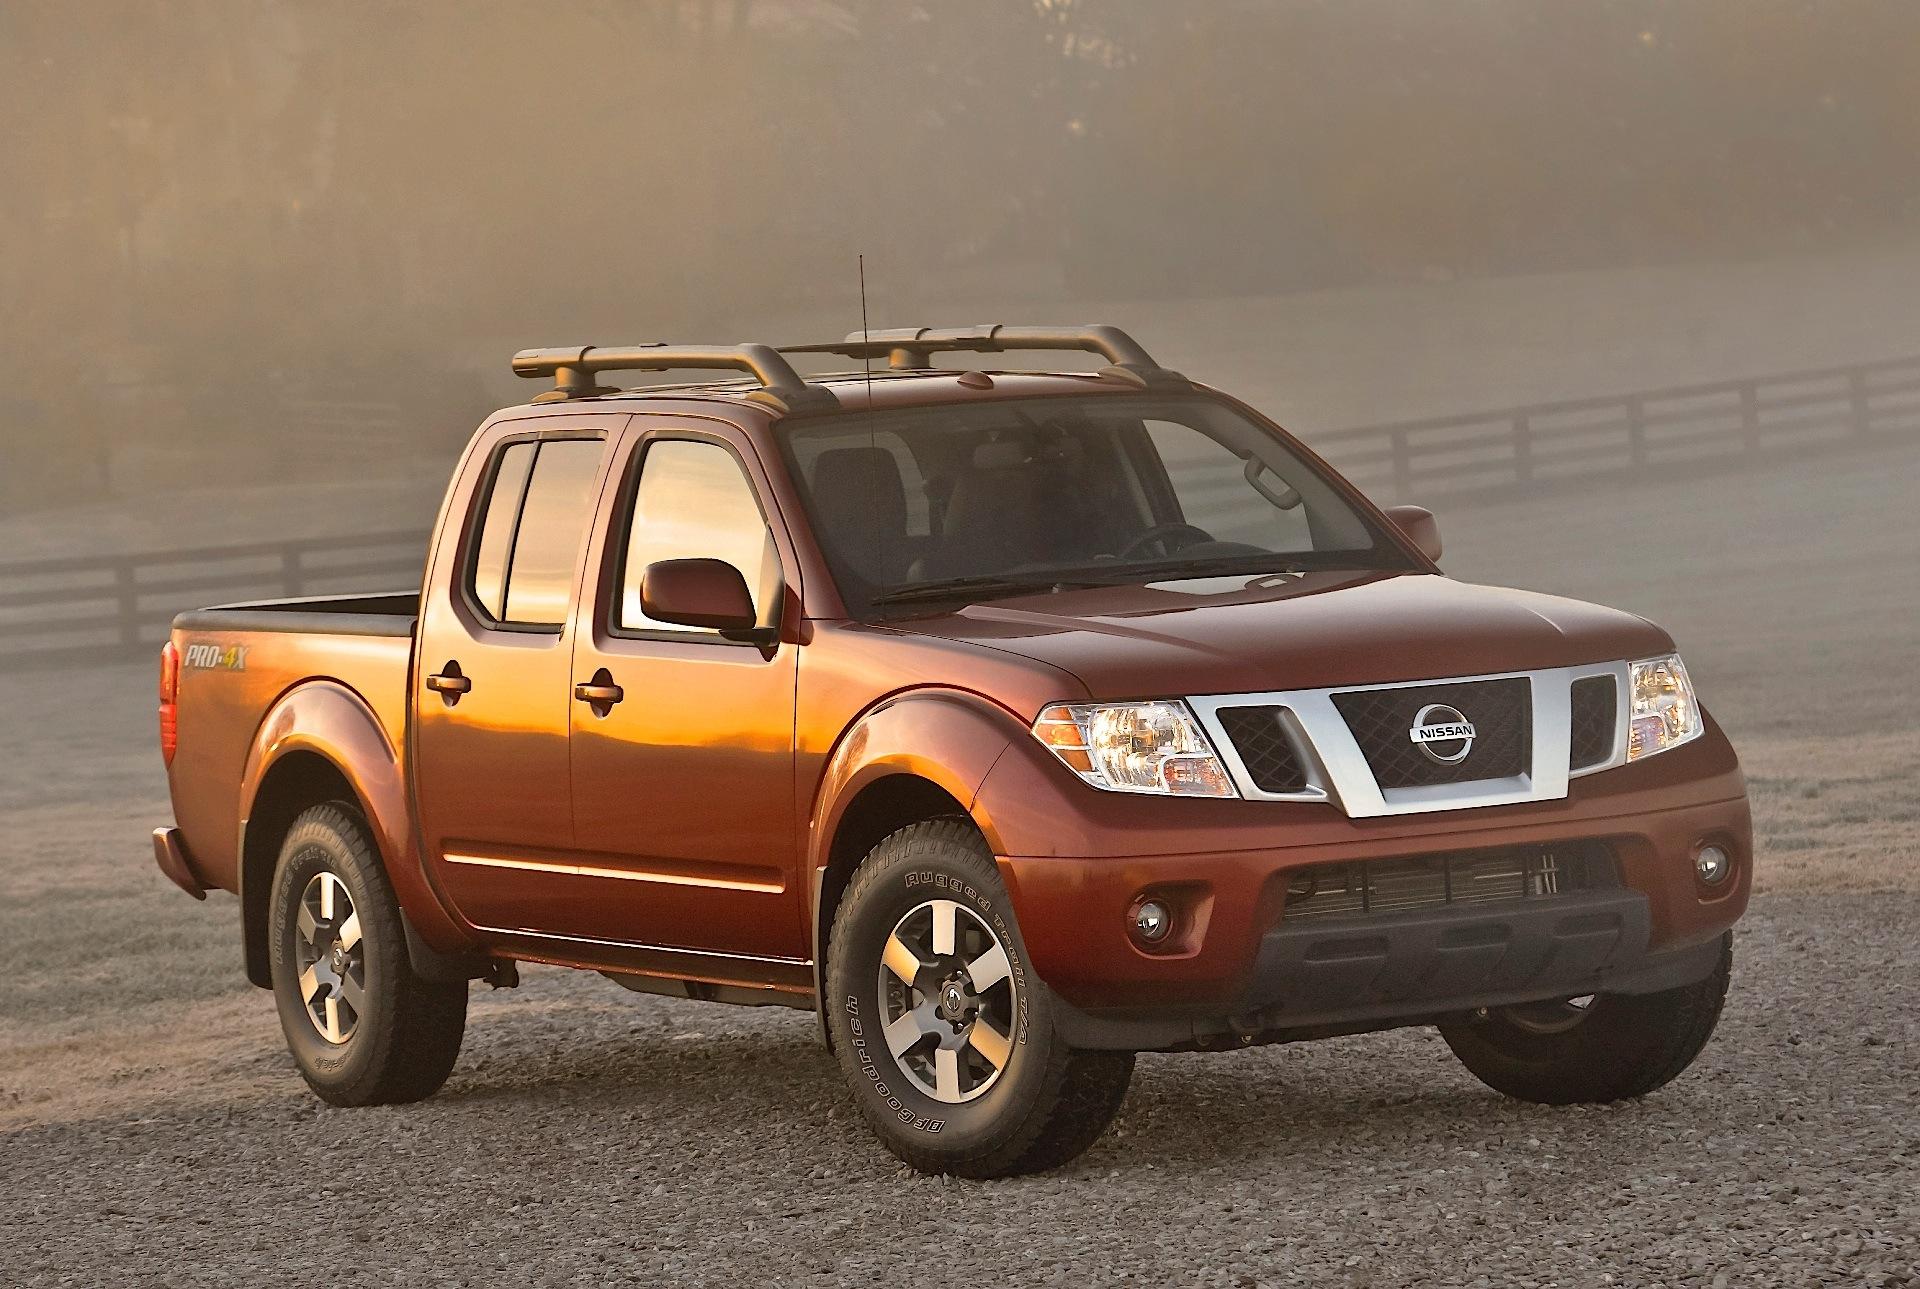 Nissan Frontier Diesel >> NISSAN Frontier - 2009, 2010, 2011, 2012, 2013, 2014, 2015, 2016, 2017 - autoevolution